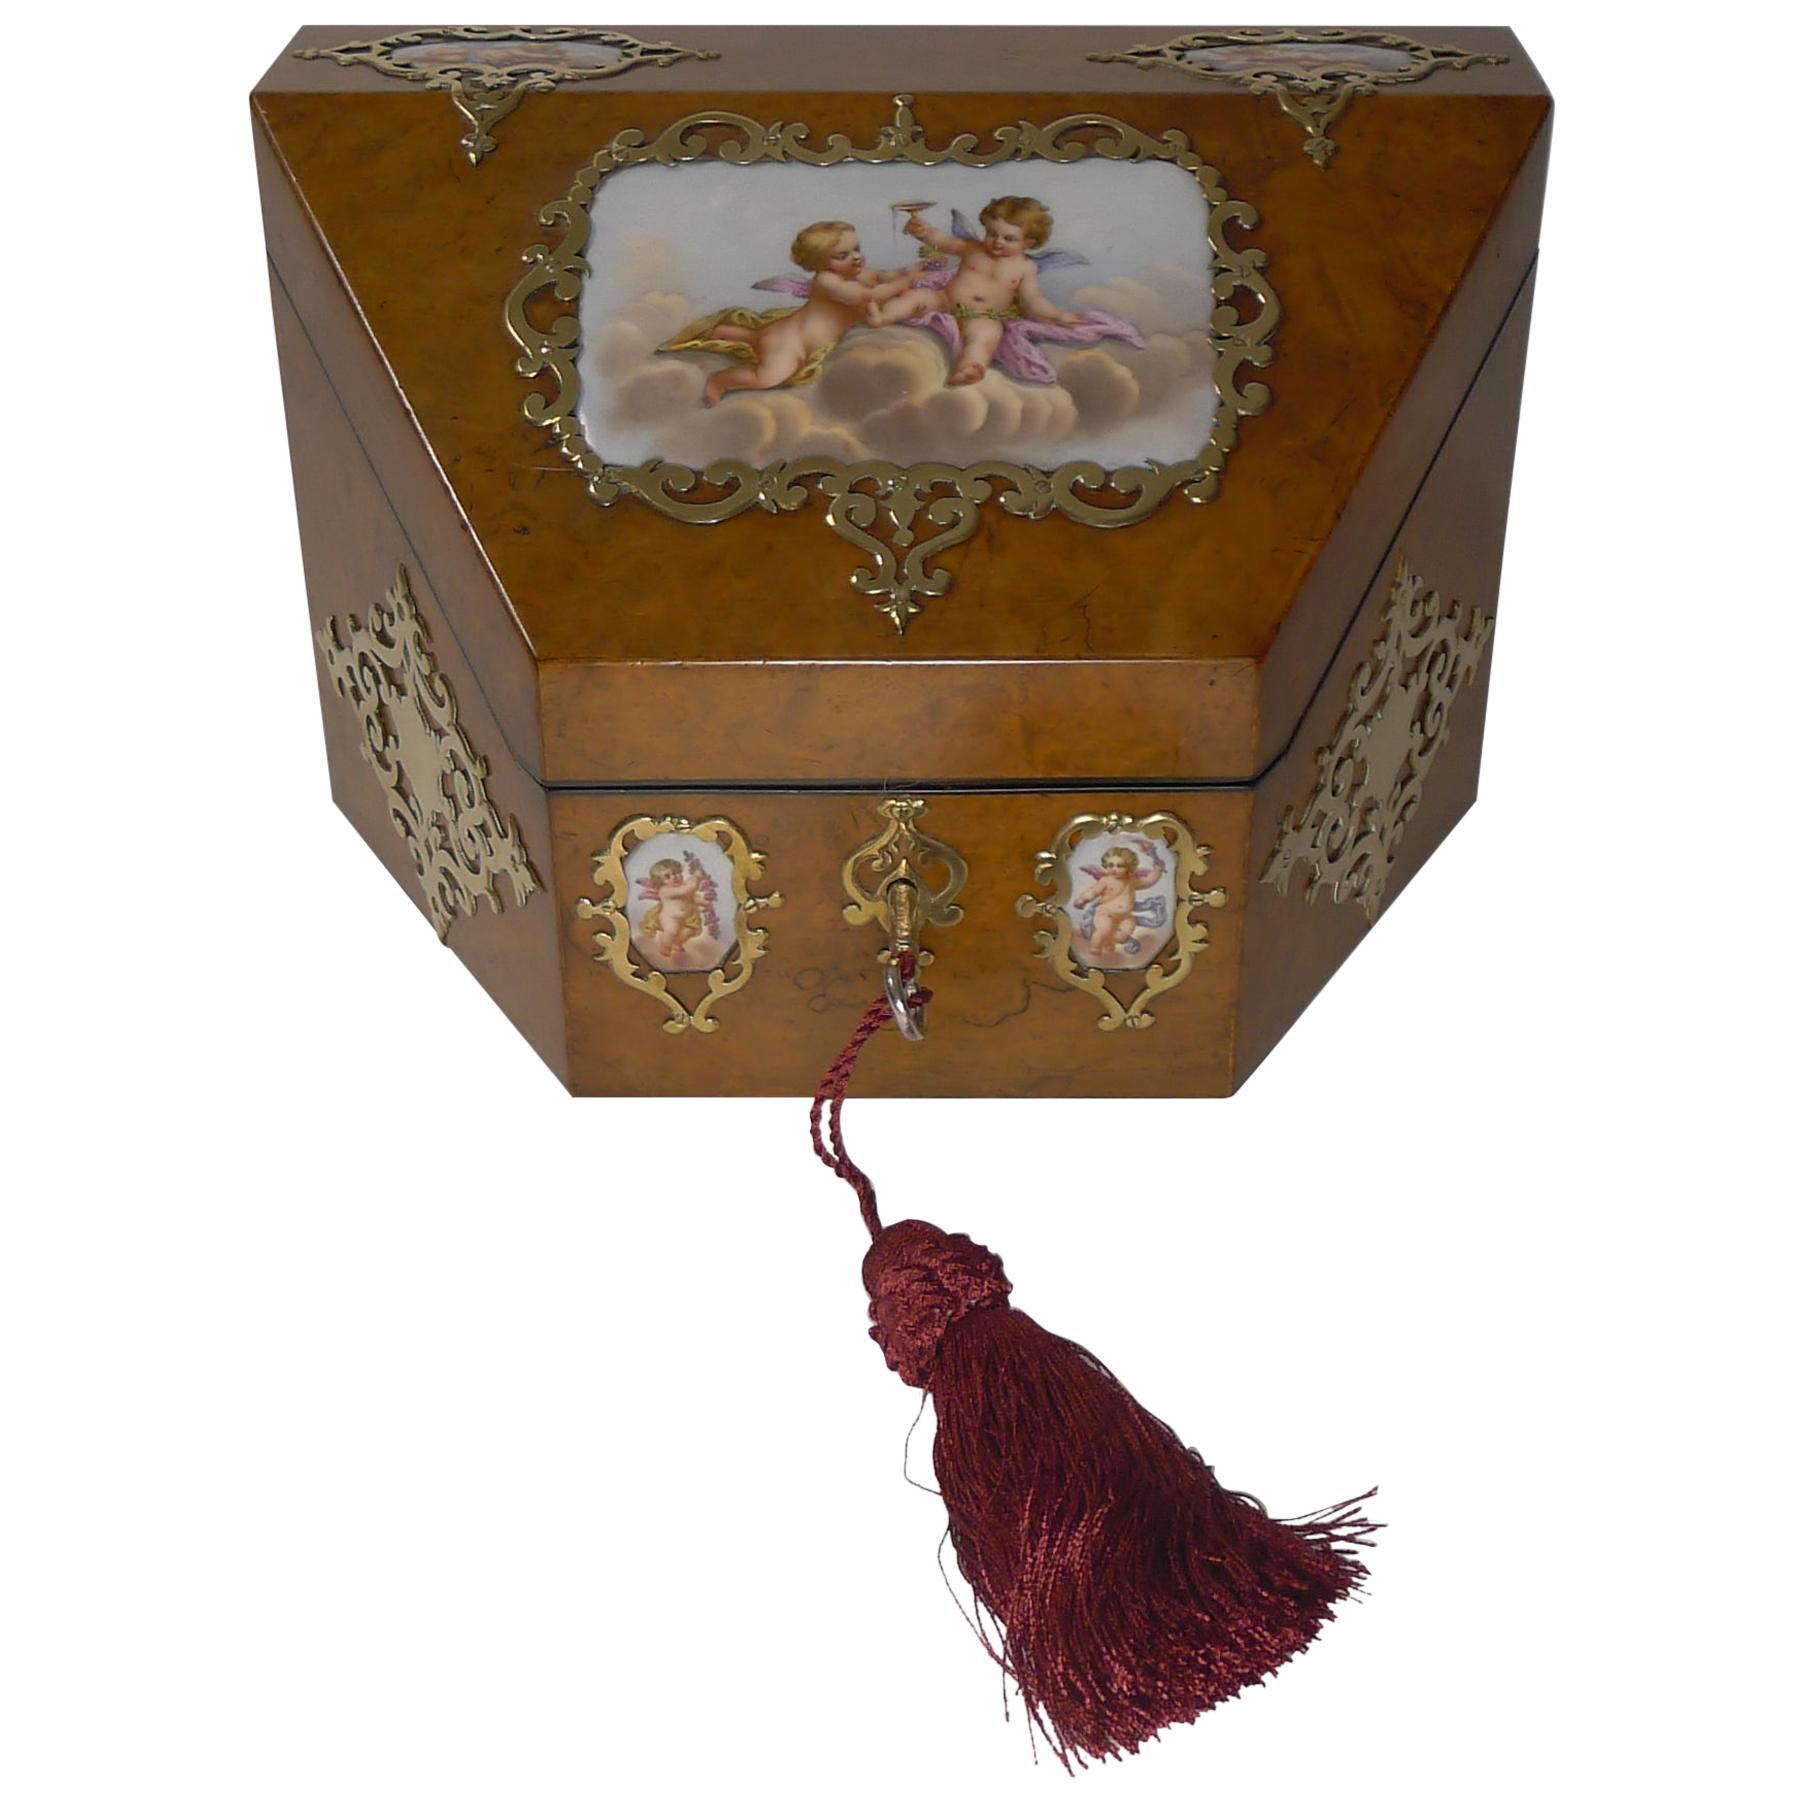 Antique English Burr Walnut & Hand Painted Porcelain Stationery Box, circa 1850